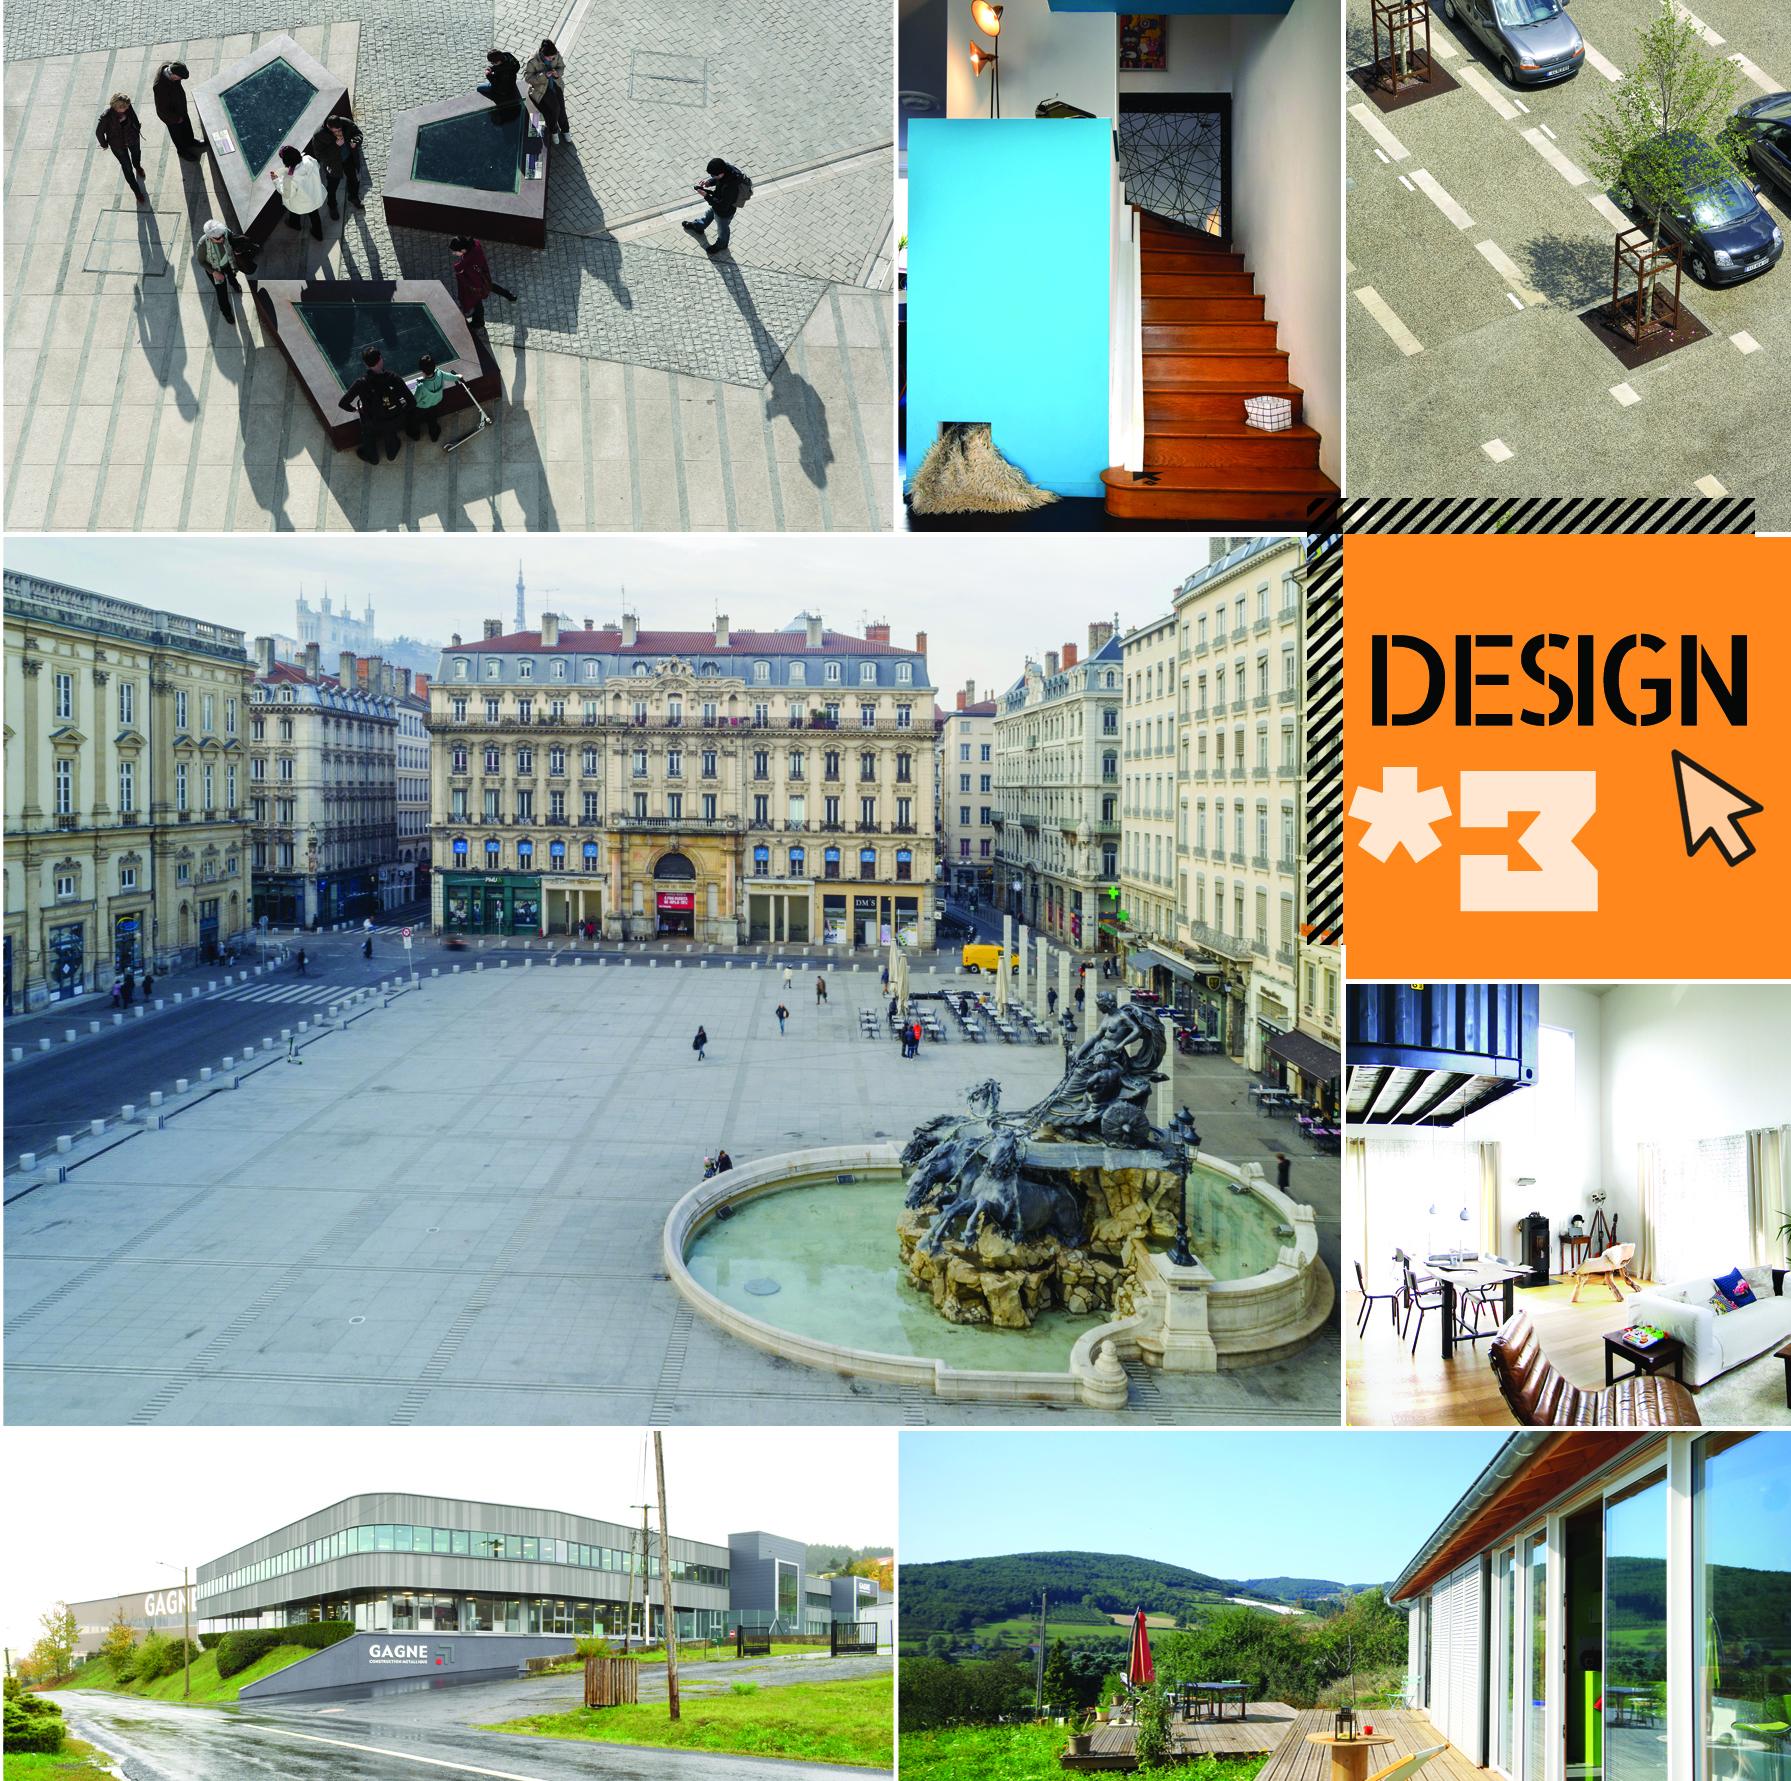 spacemaker-architecture-urbanisme-design